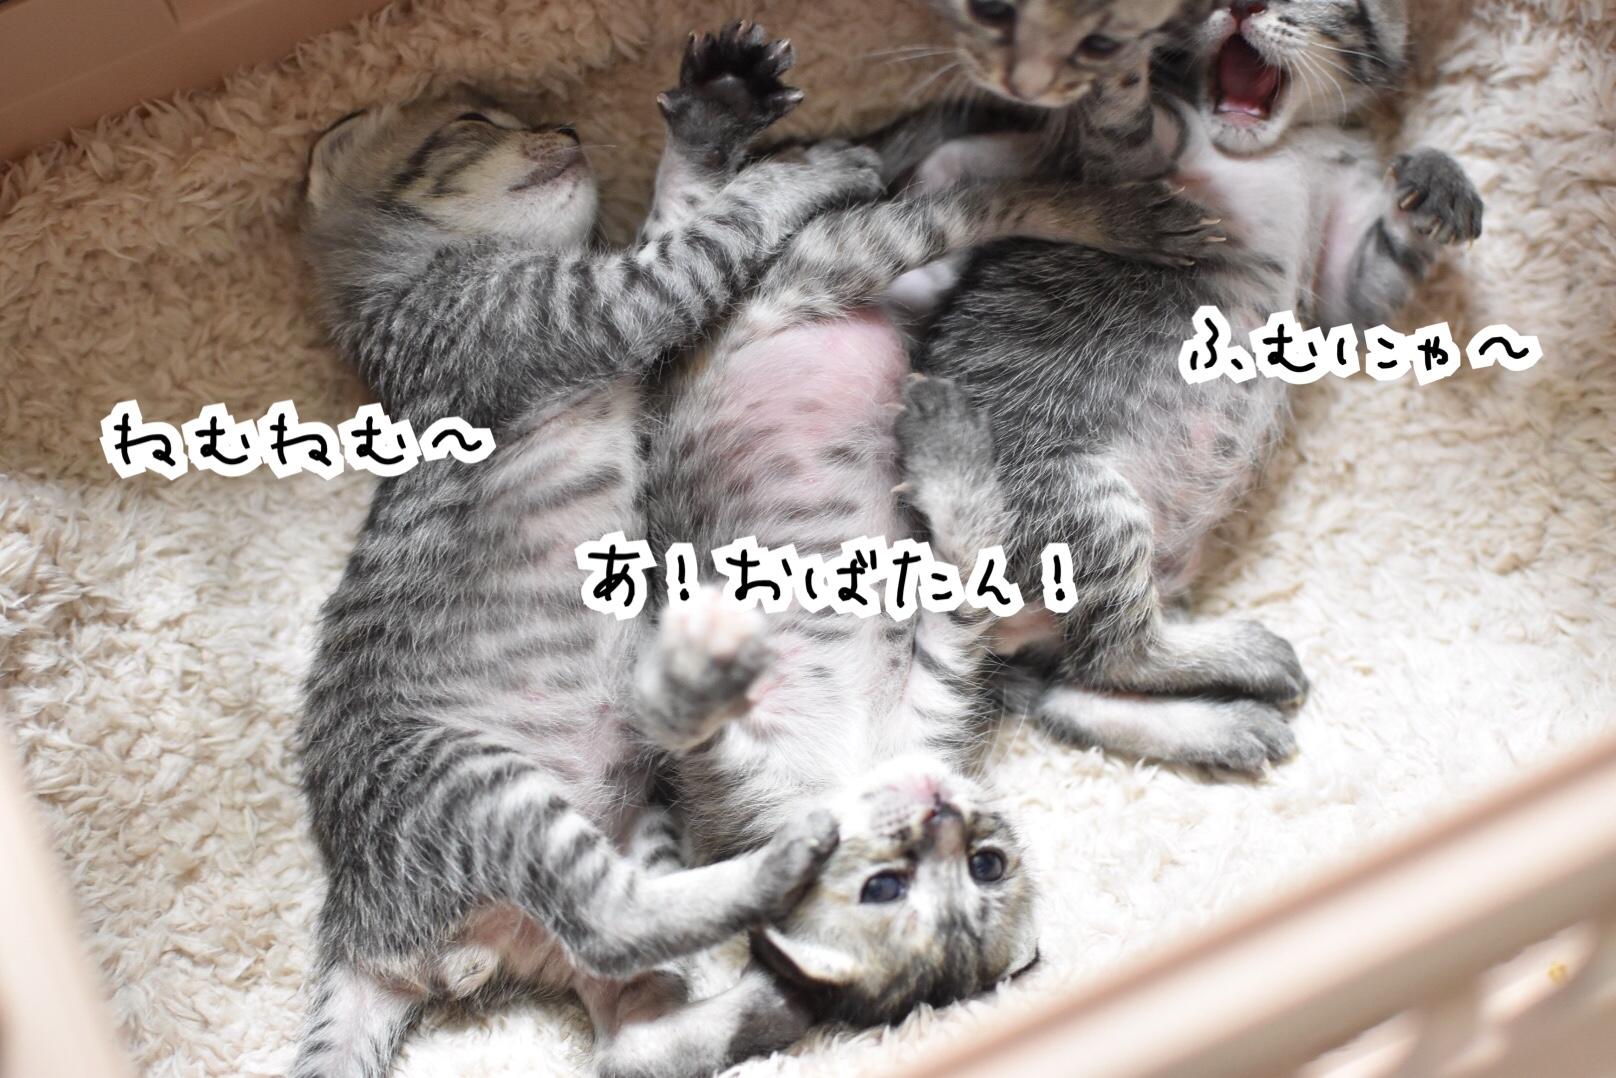 fc2blog_20190419041920384.jpg